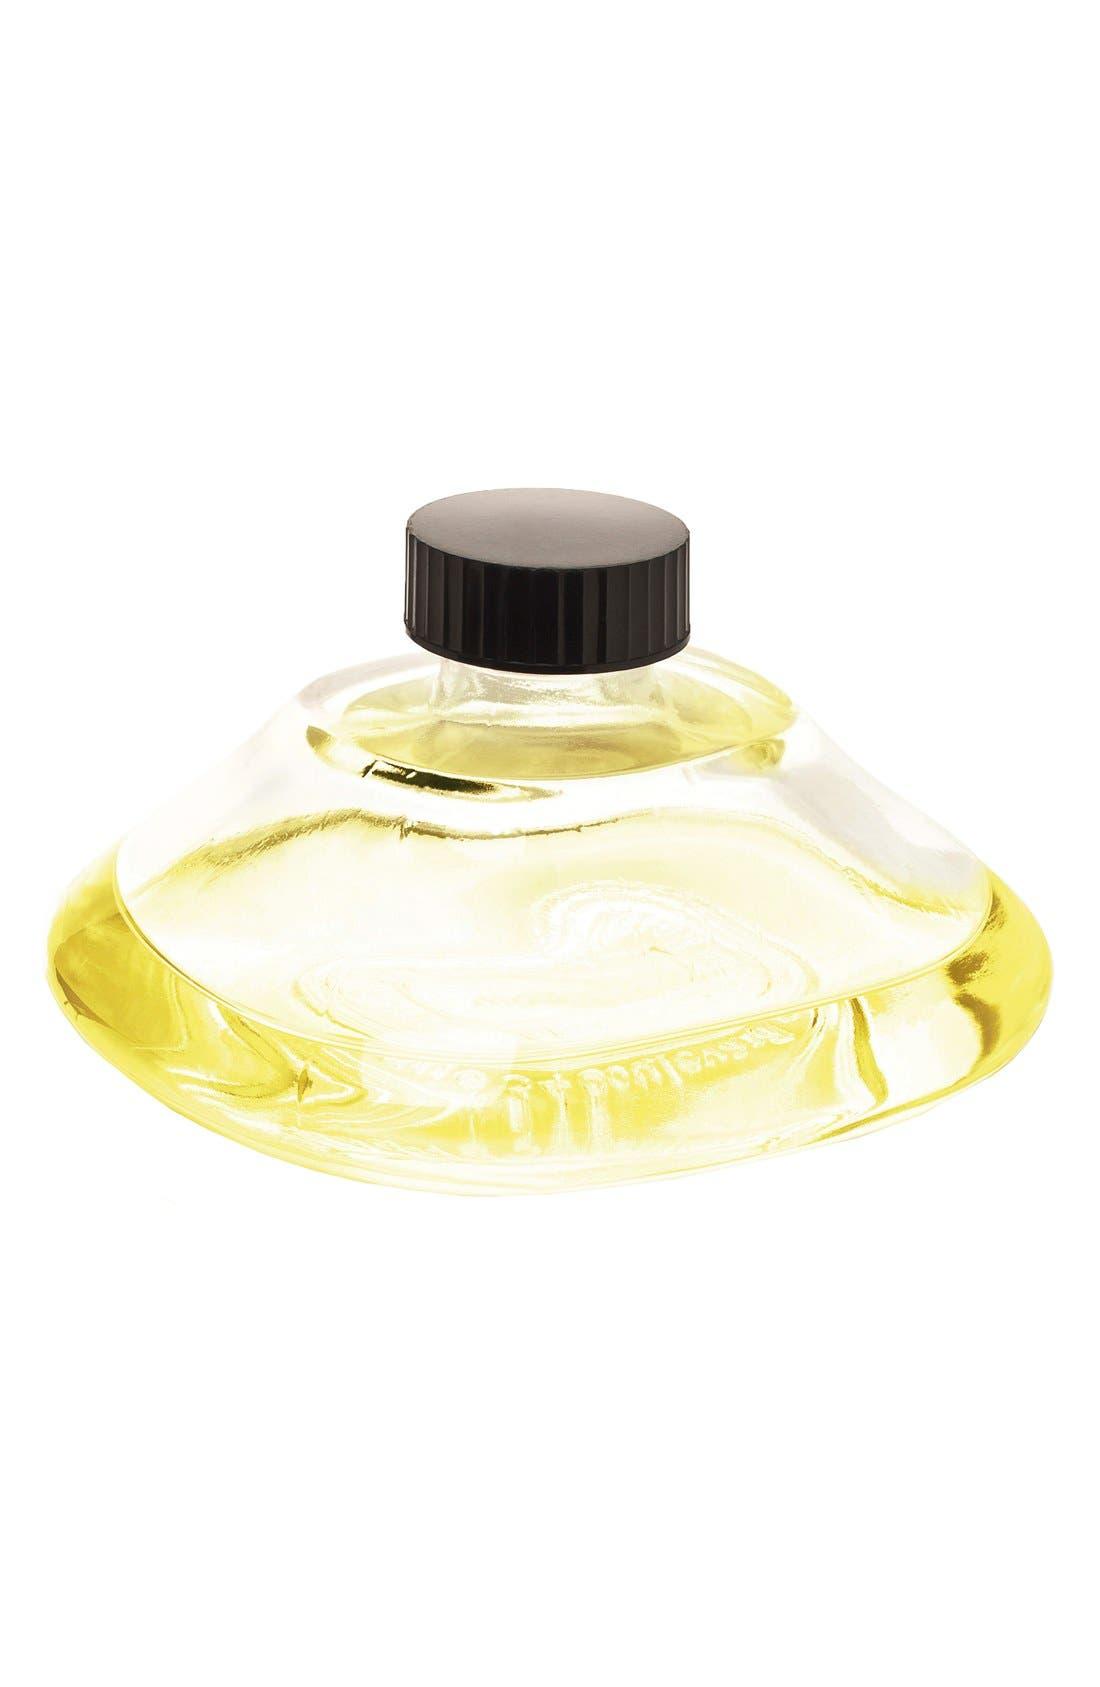 'Orange Blossom' Hourglass Diffuser Refill,                             Main thumbnail 1, color,                             No Color